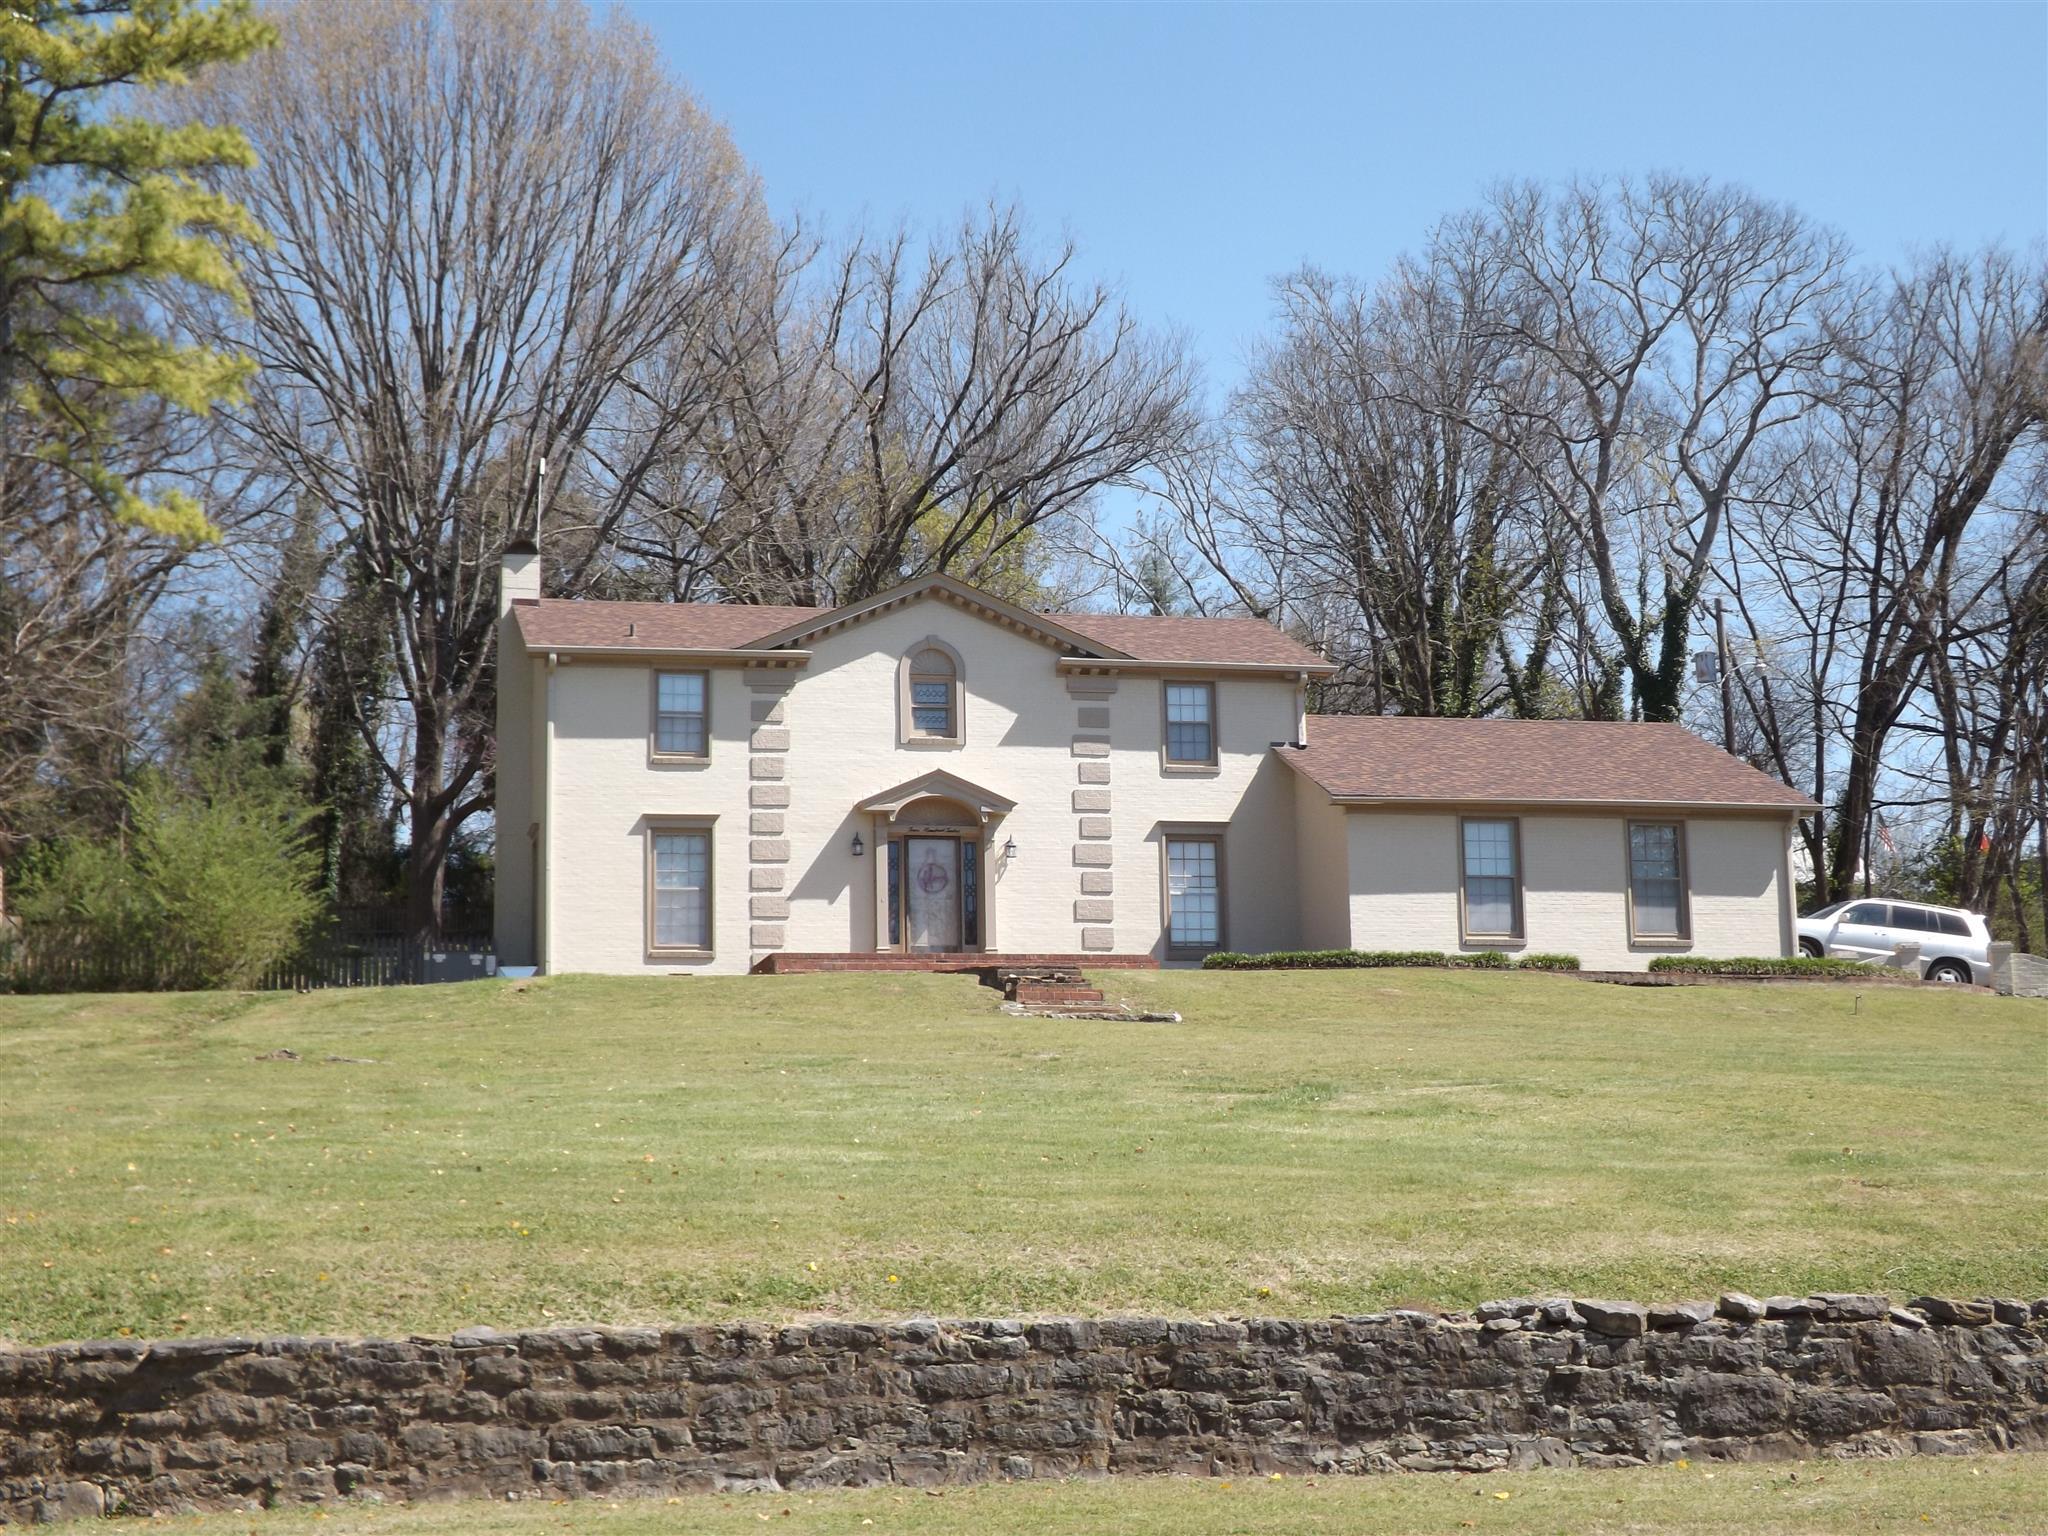 412 W Jefferson St, Pulaski, TN 38478 - Pulaski, TN real estate listing